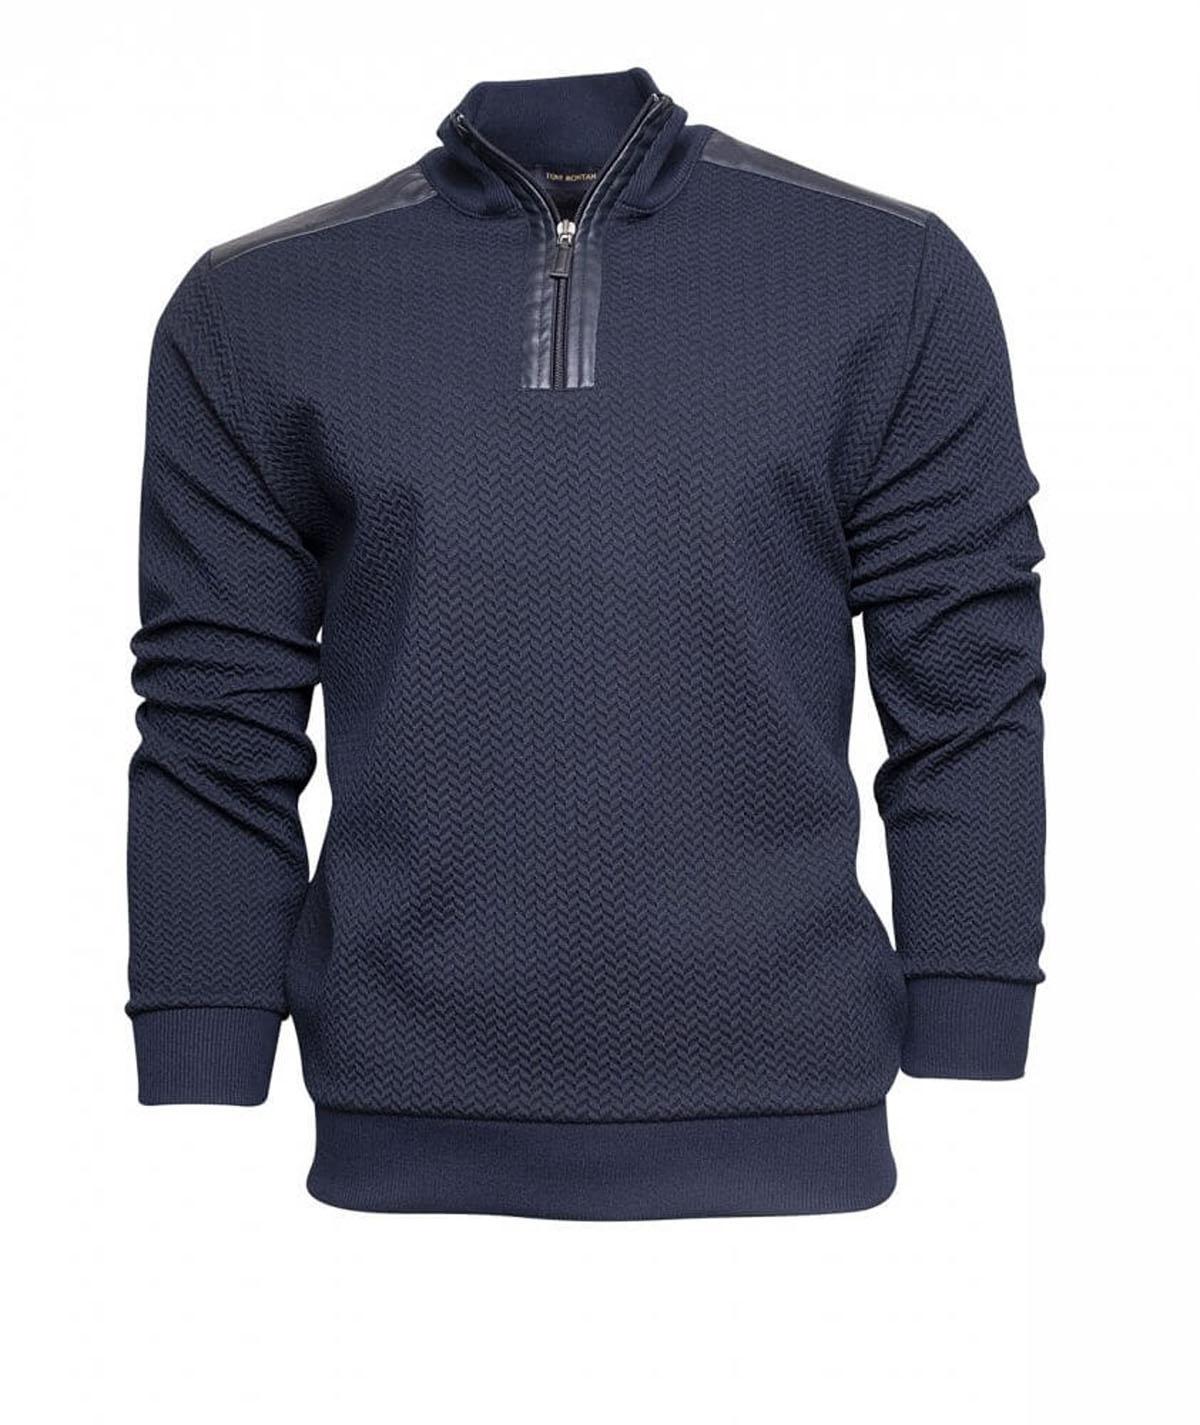 Erkek Sweatshirt Lacivert